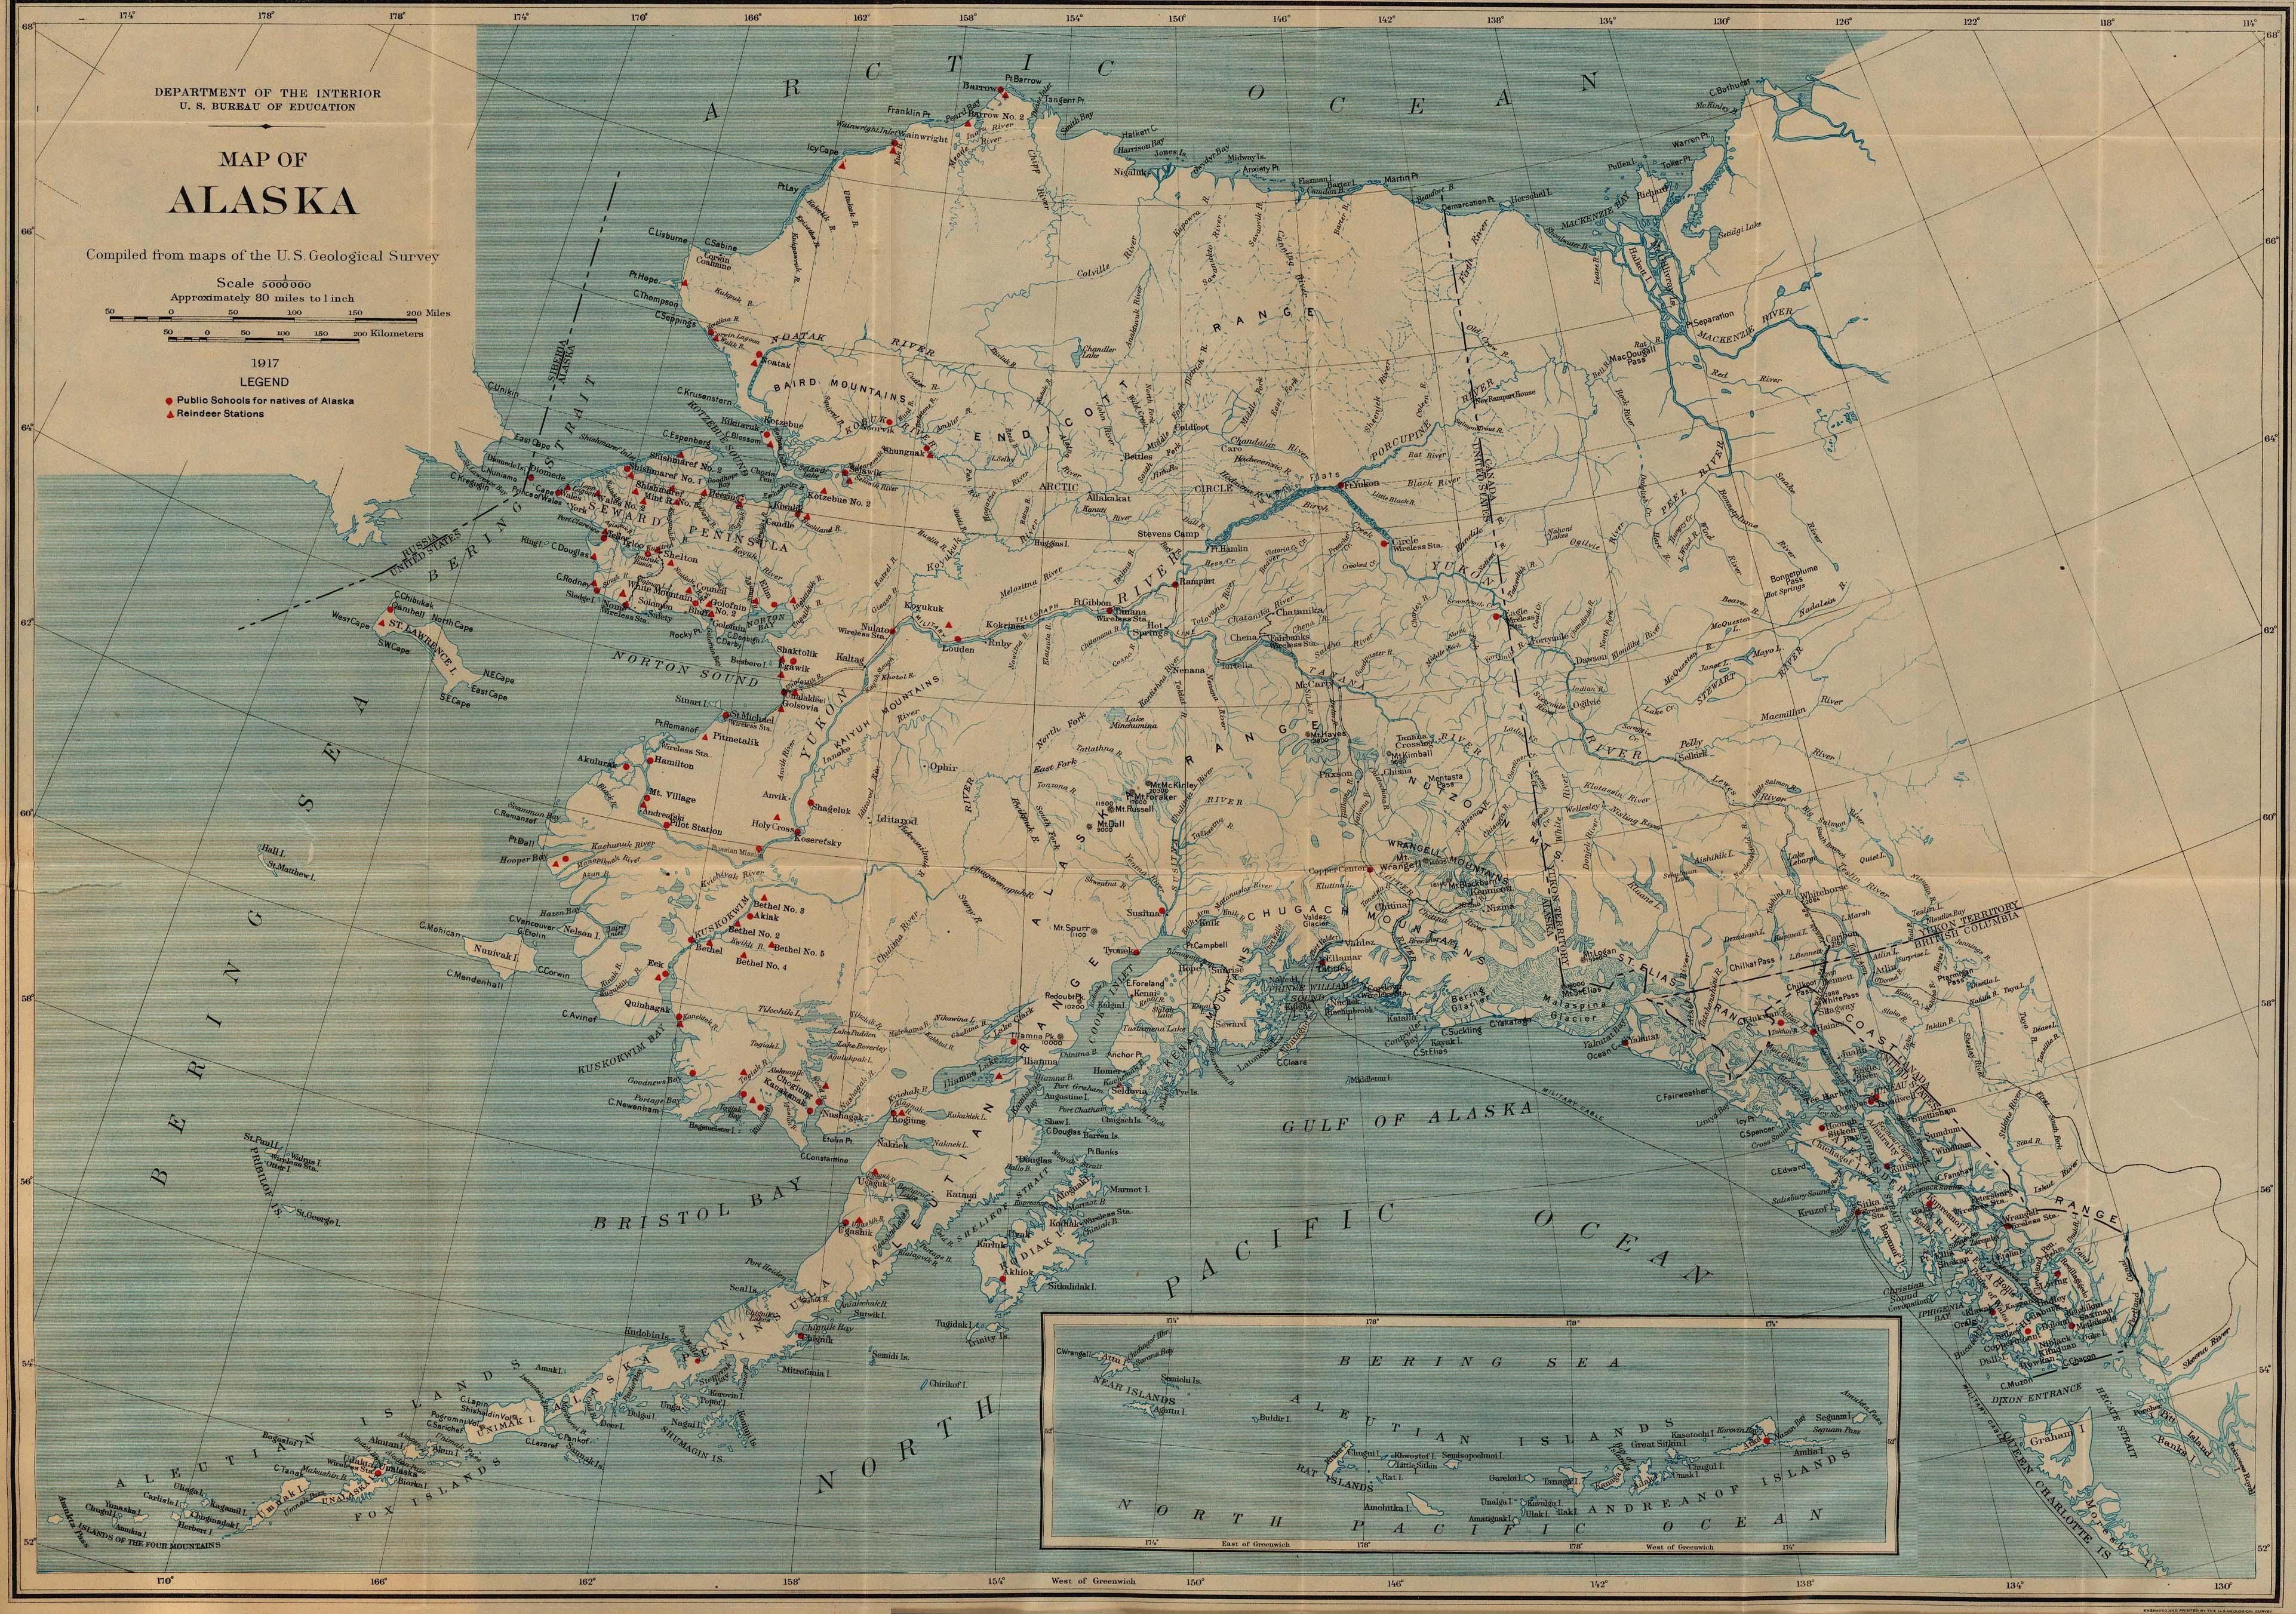 Department Of The Interior Organizational Chart: Alaska stations 1917.jpg - Wikimedia Commons,Chart